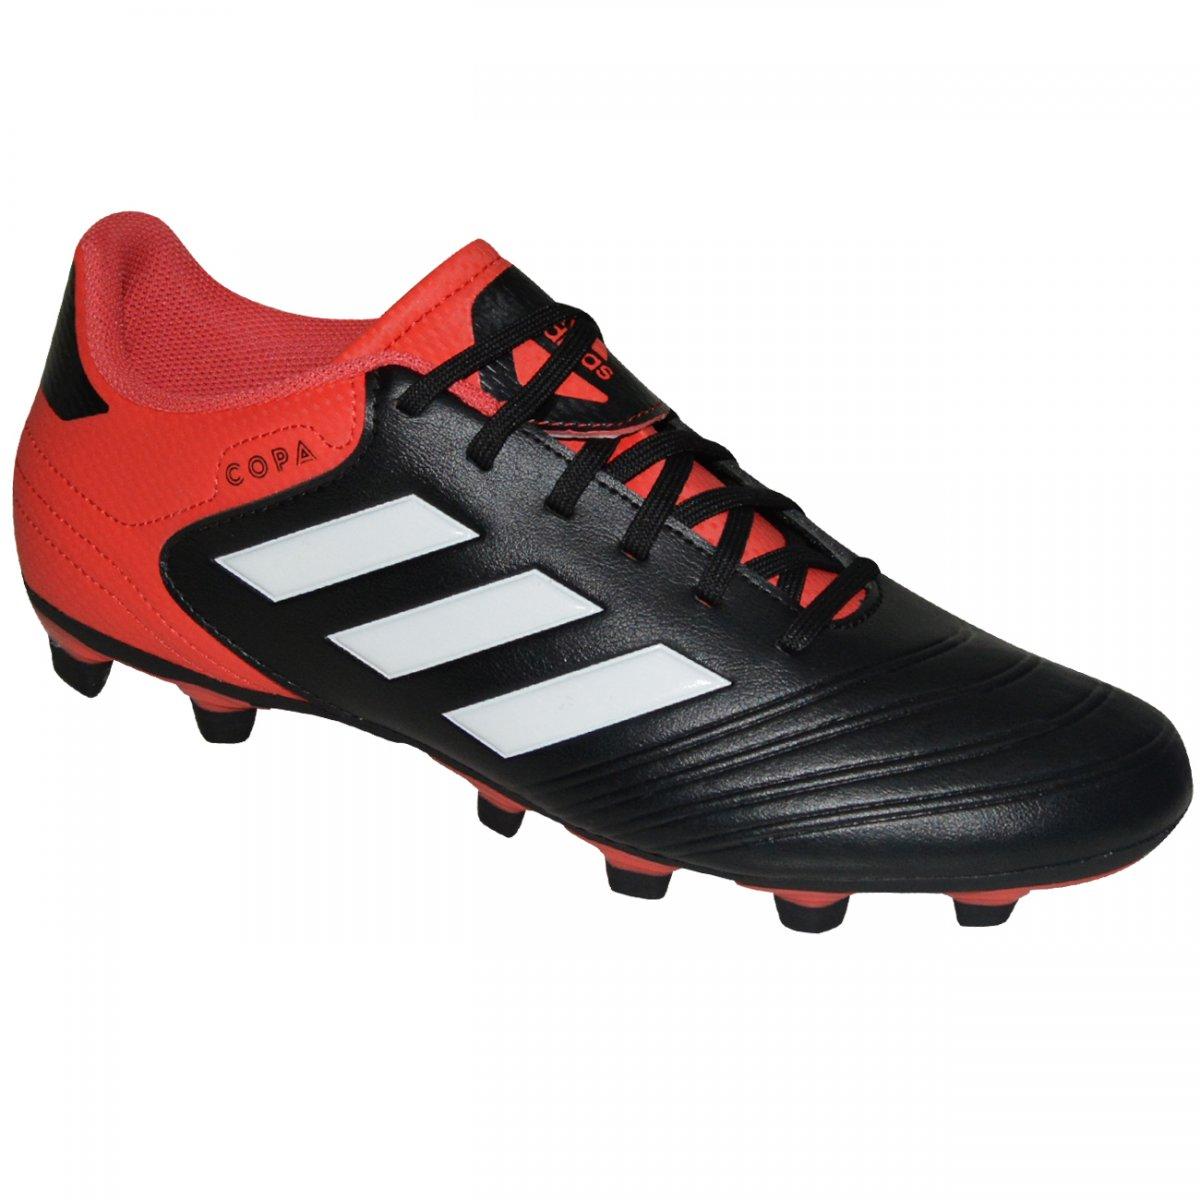 1715b87c4c Chuteira Adidas Copa 18.4 CP8960 - Preto vermelho - Chuteira Nike ...